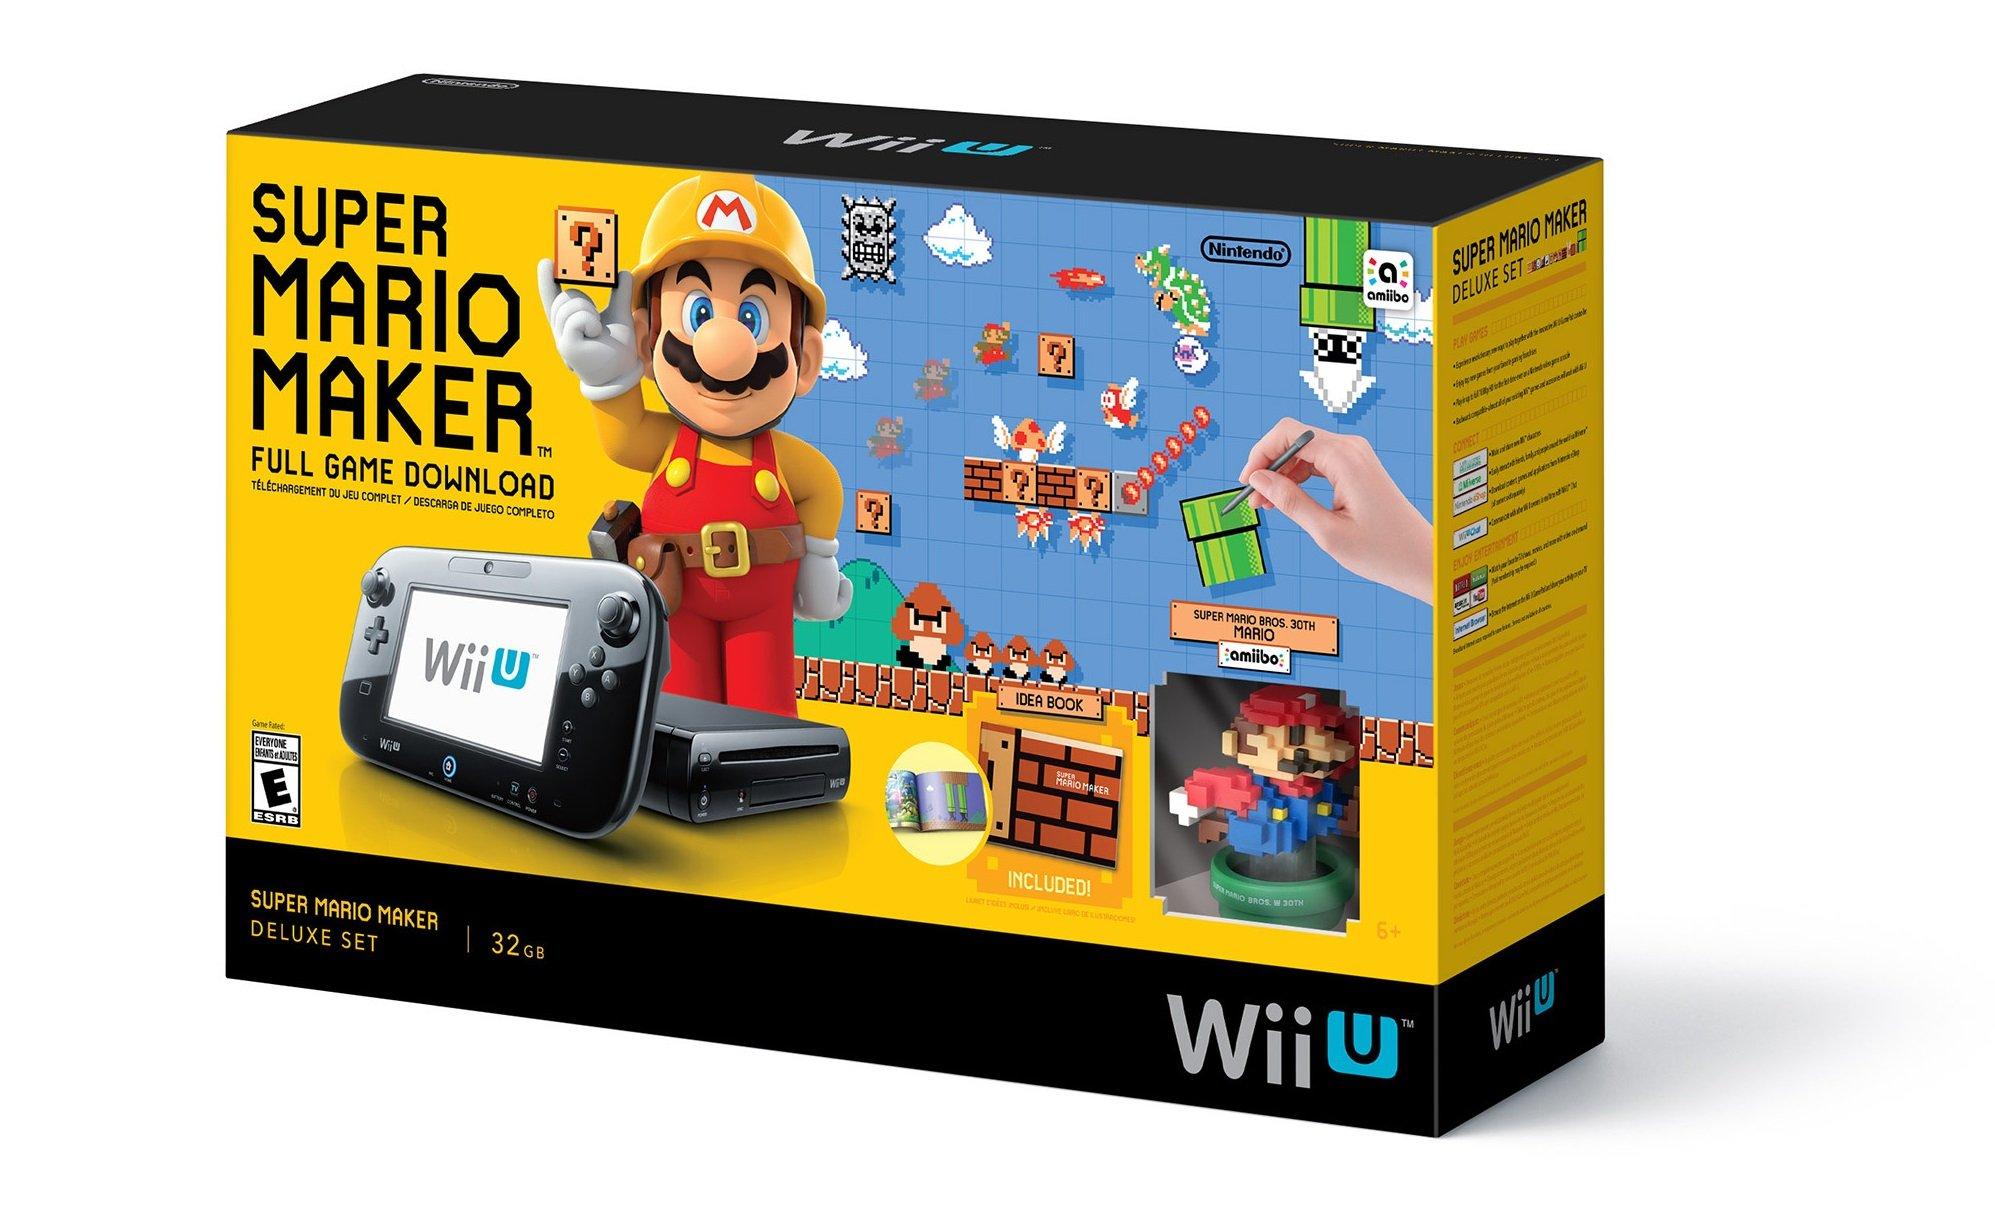 Super Mario Maker Wii U Console Bundle Up On Walmart – My Nintendo ...